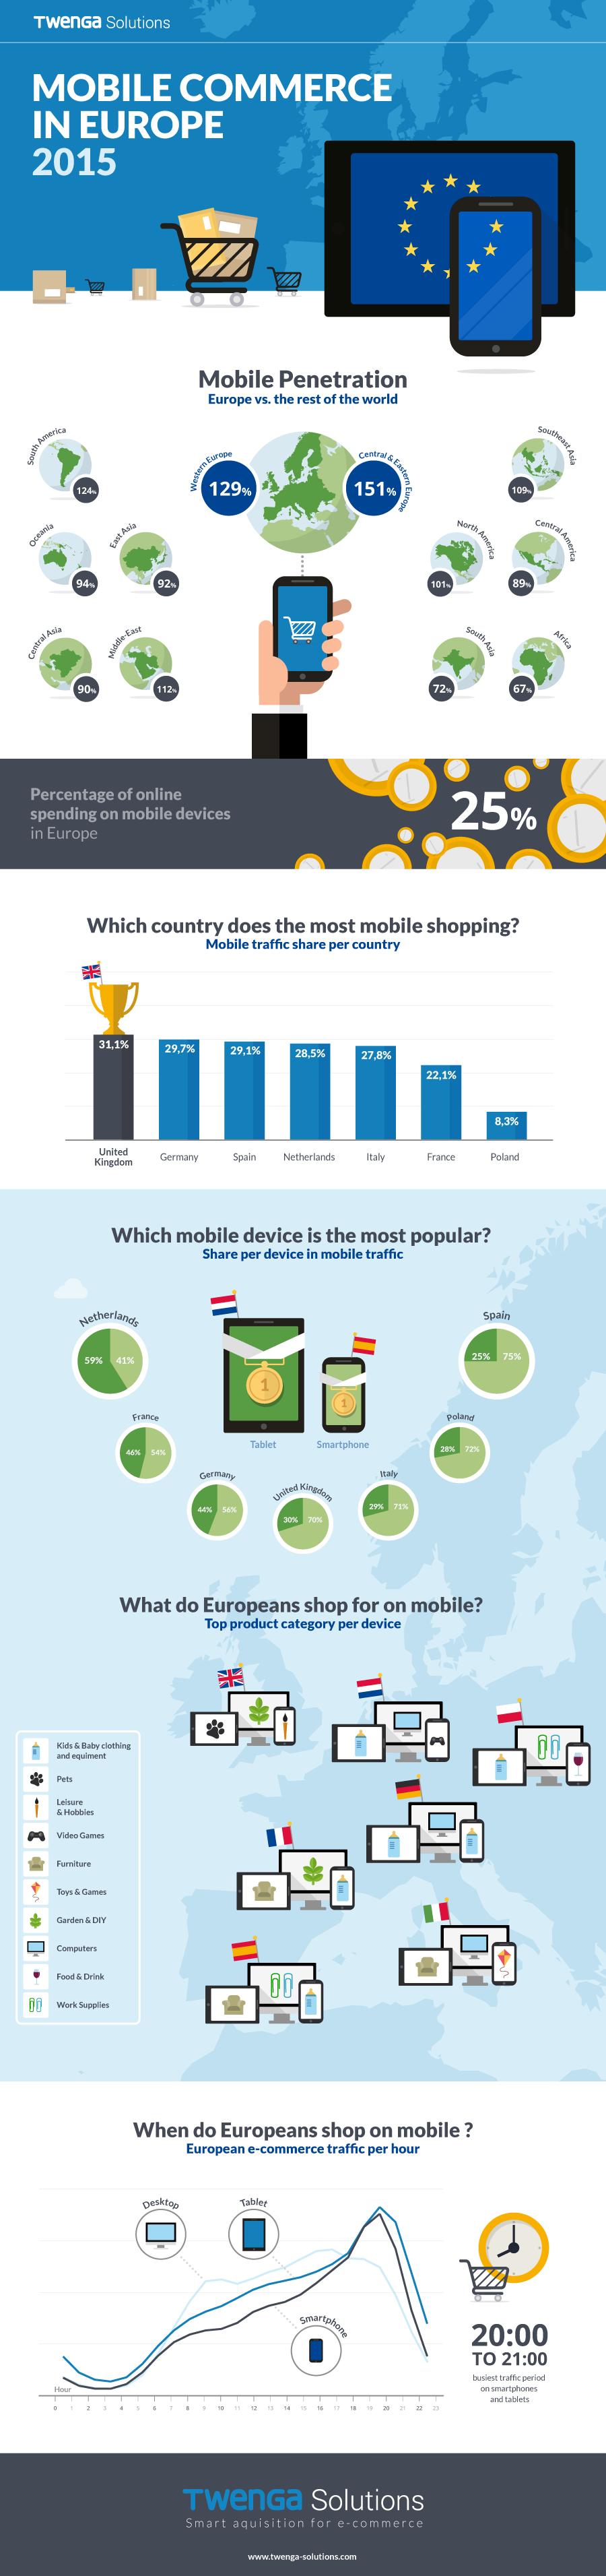 twenga-infografia-mobile-commerce-europe-2015-blog-hostalia-hosting